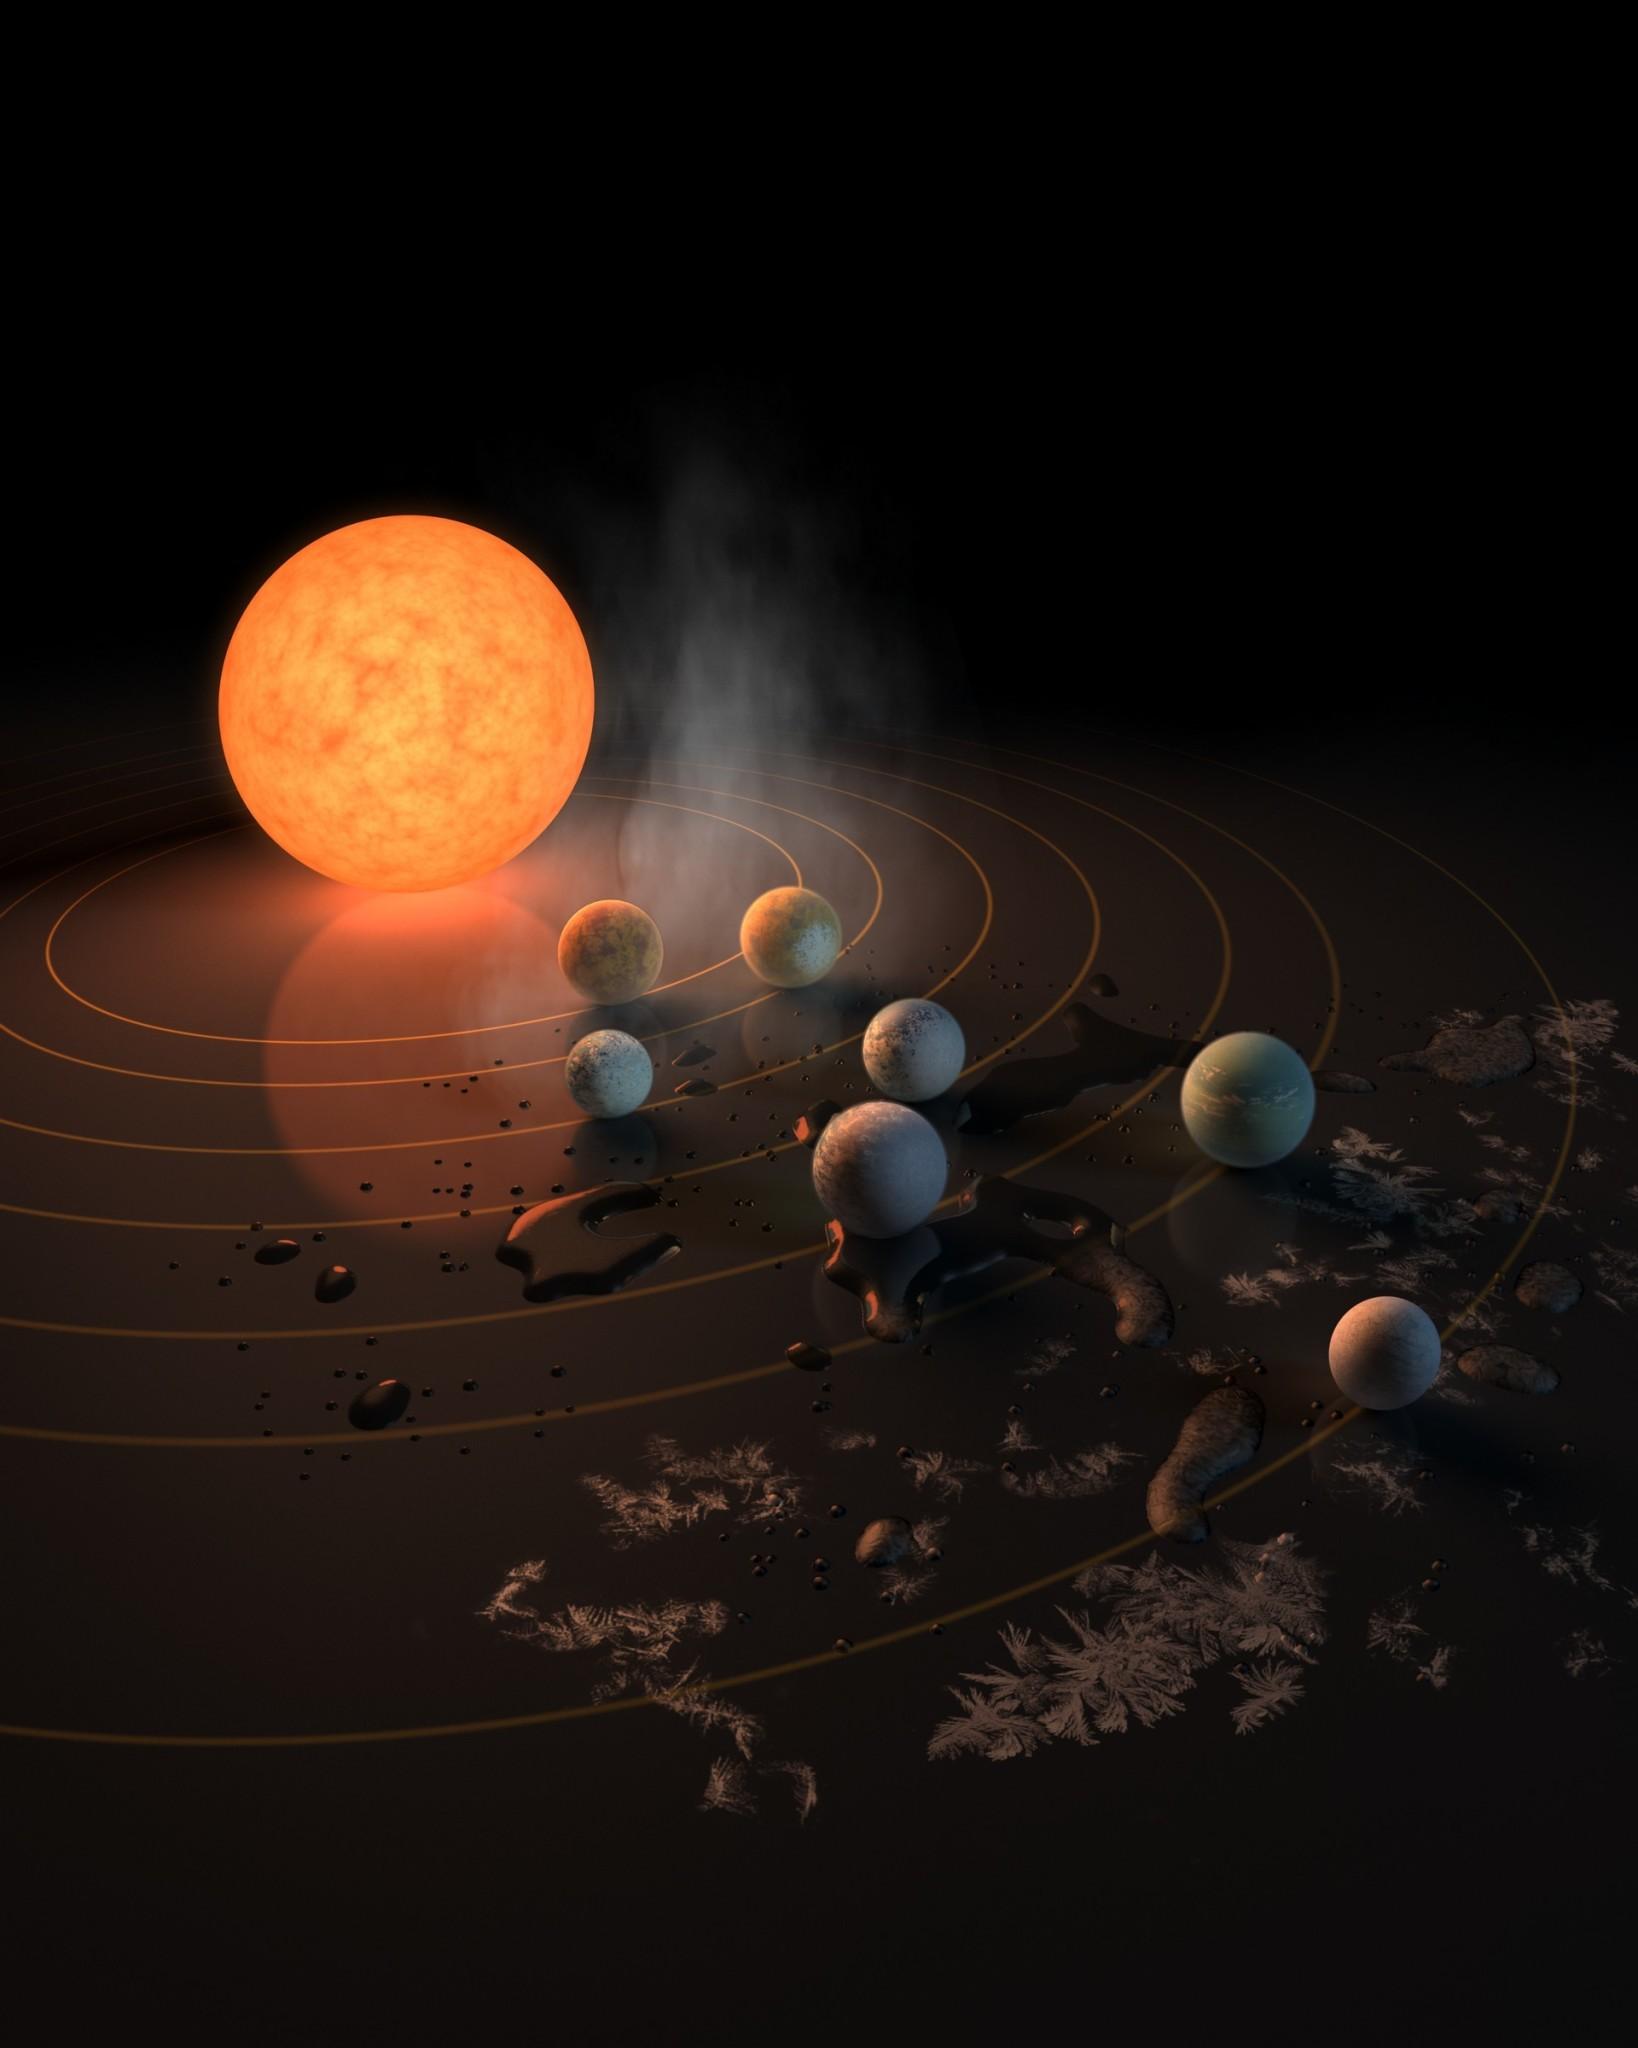 NASA: annunciata un'importante conferenza stampa